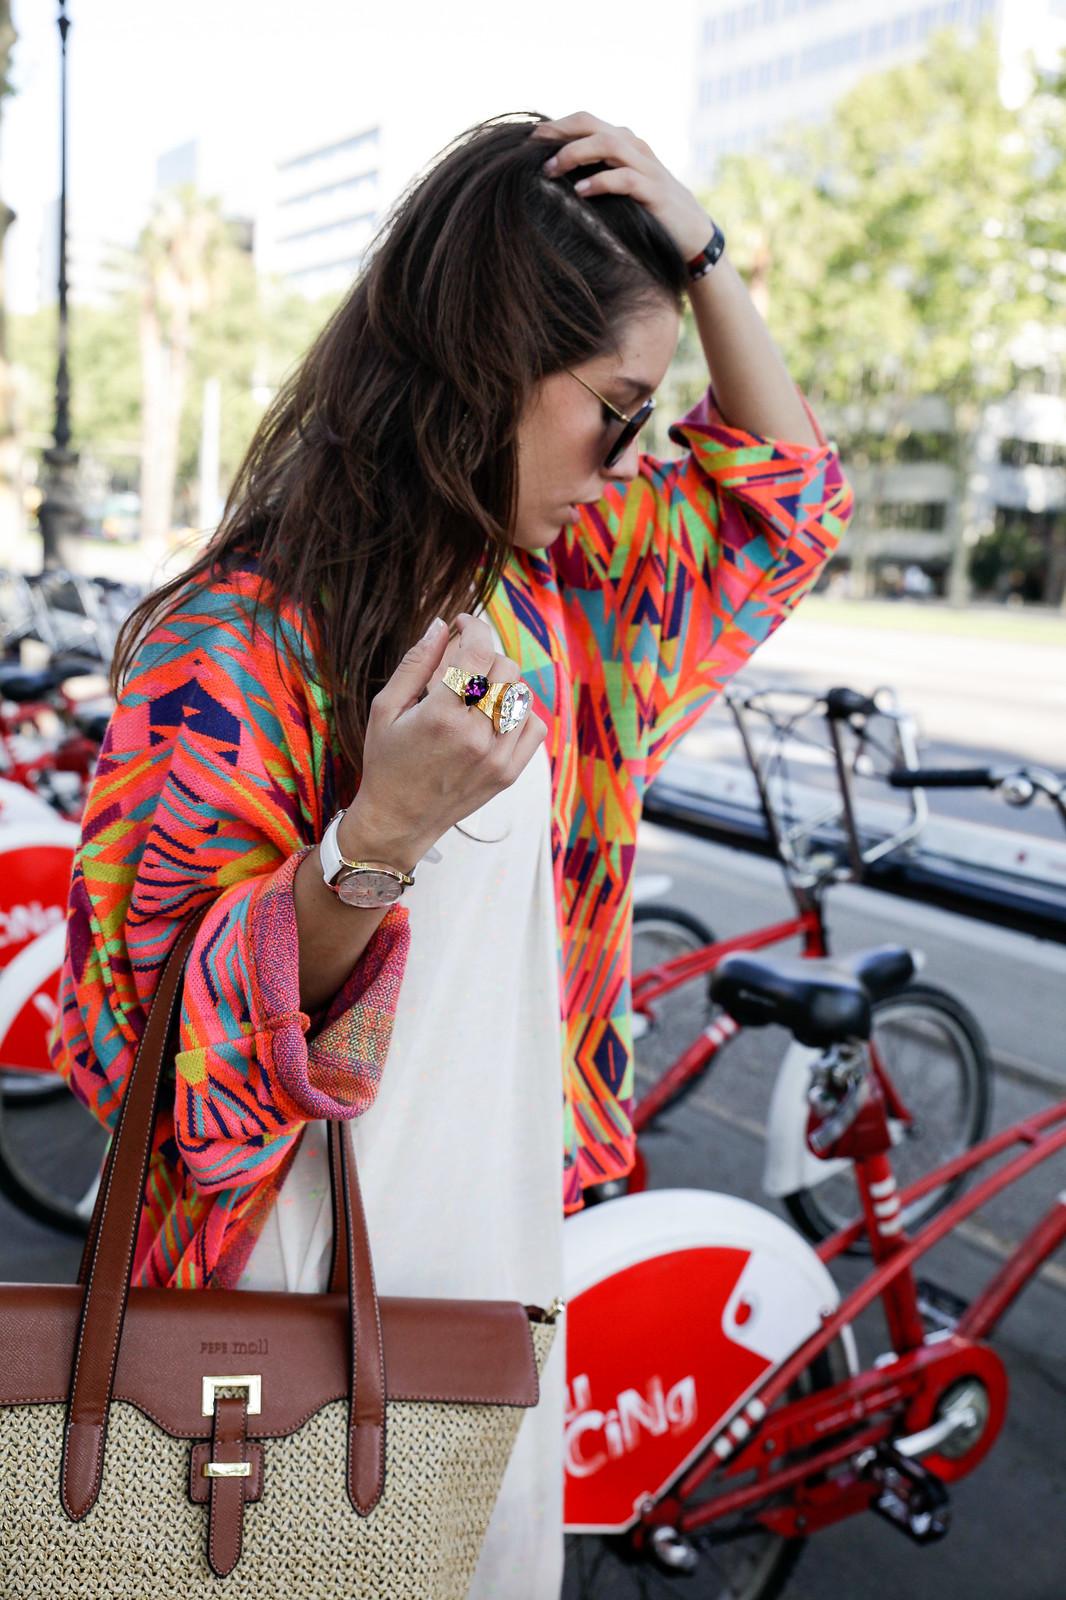 08_kimono_look_street_style_barcelona_theguestgirl_pepe_moll_ruga_caroline_svedbom_kapten_son